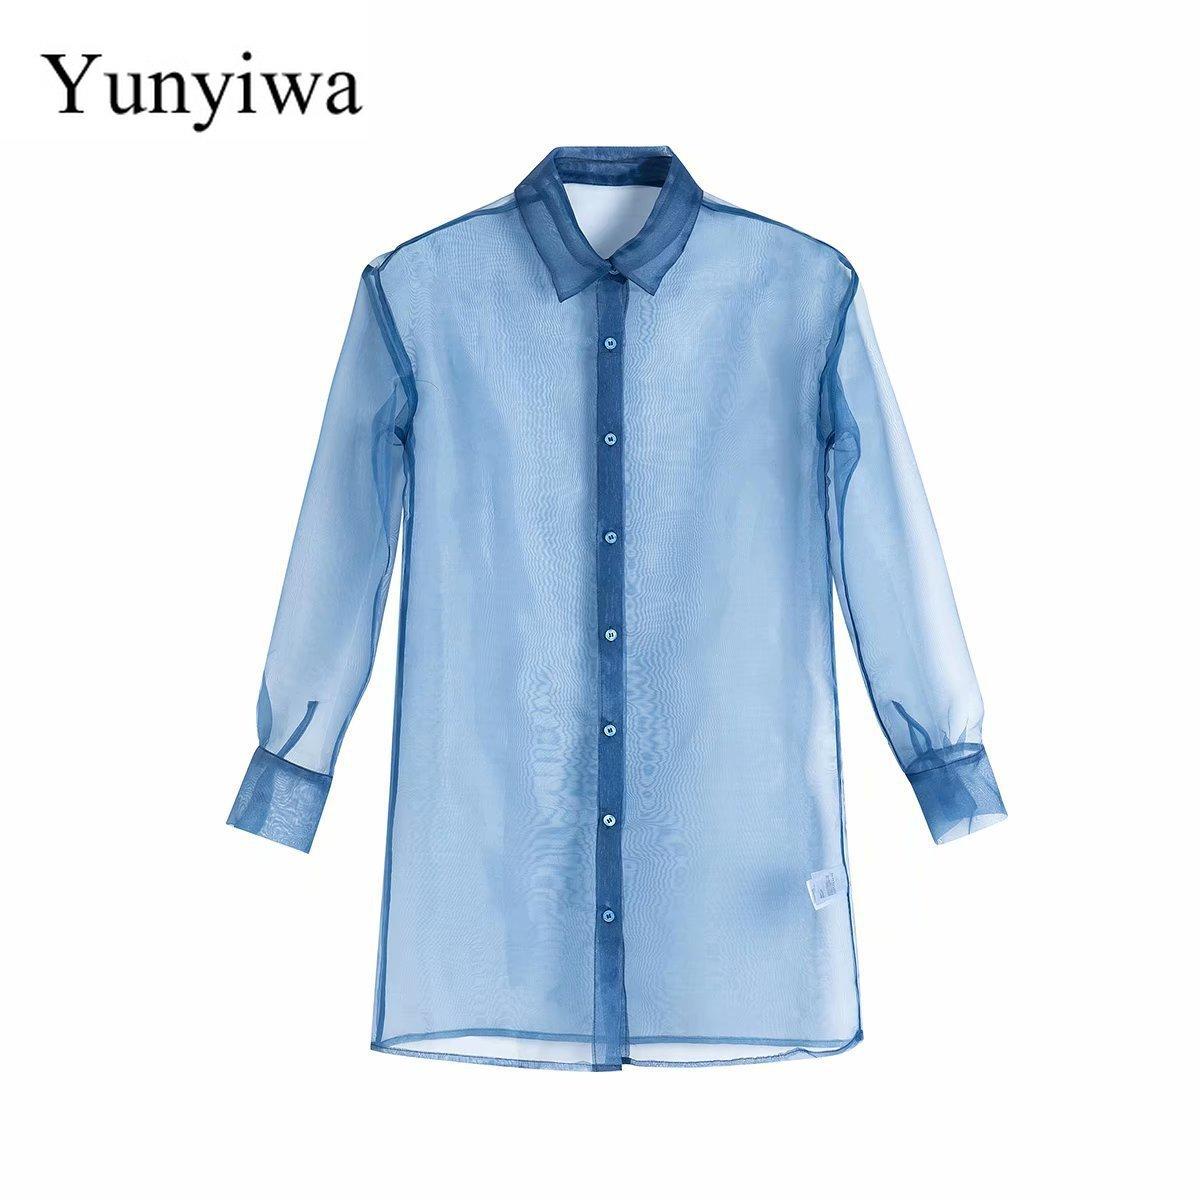 2020 Women's Organza Long Transparent Shirt Womens Blouse Vintage Party Shirts Tops Clothing Blusas Mujer